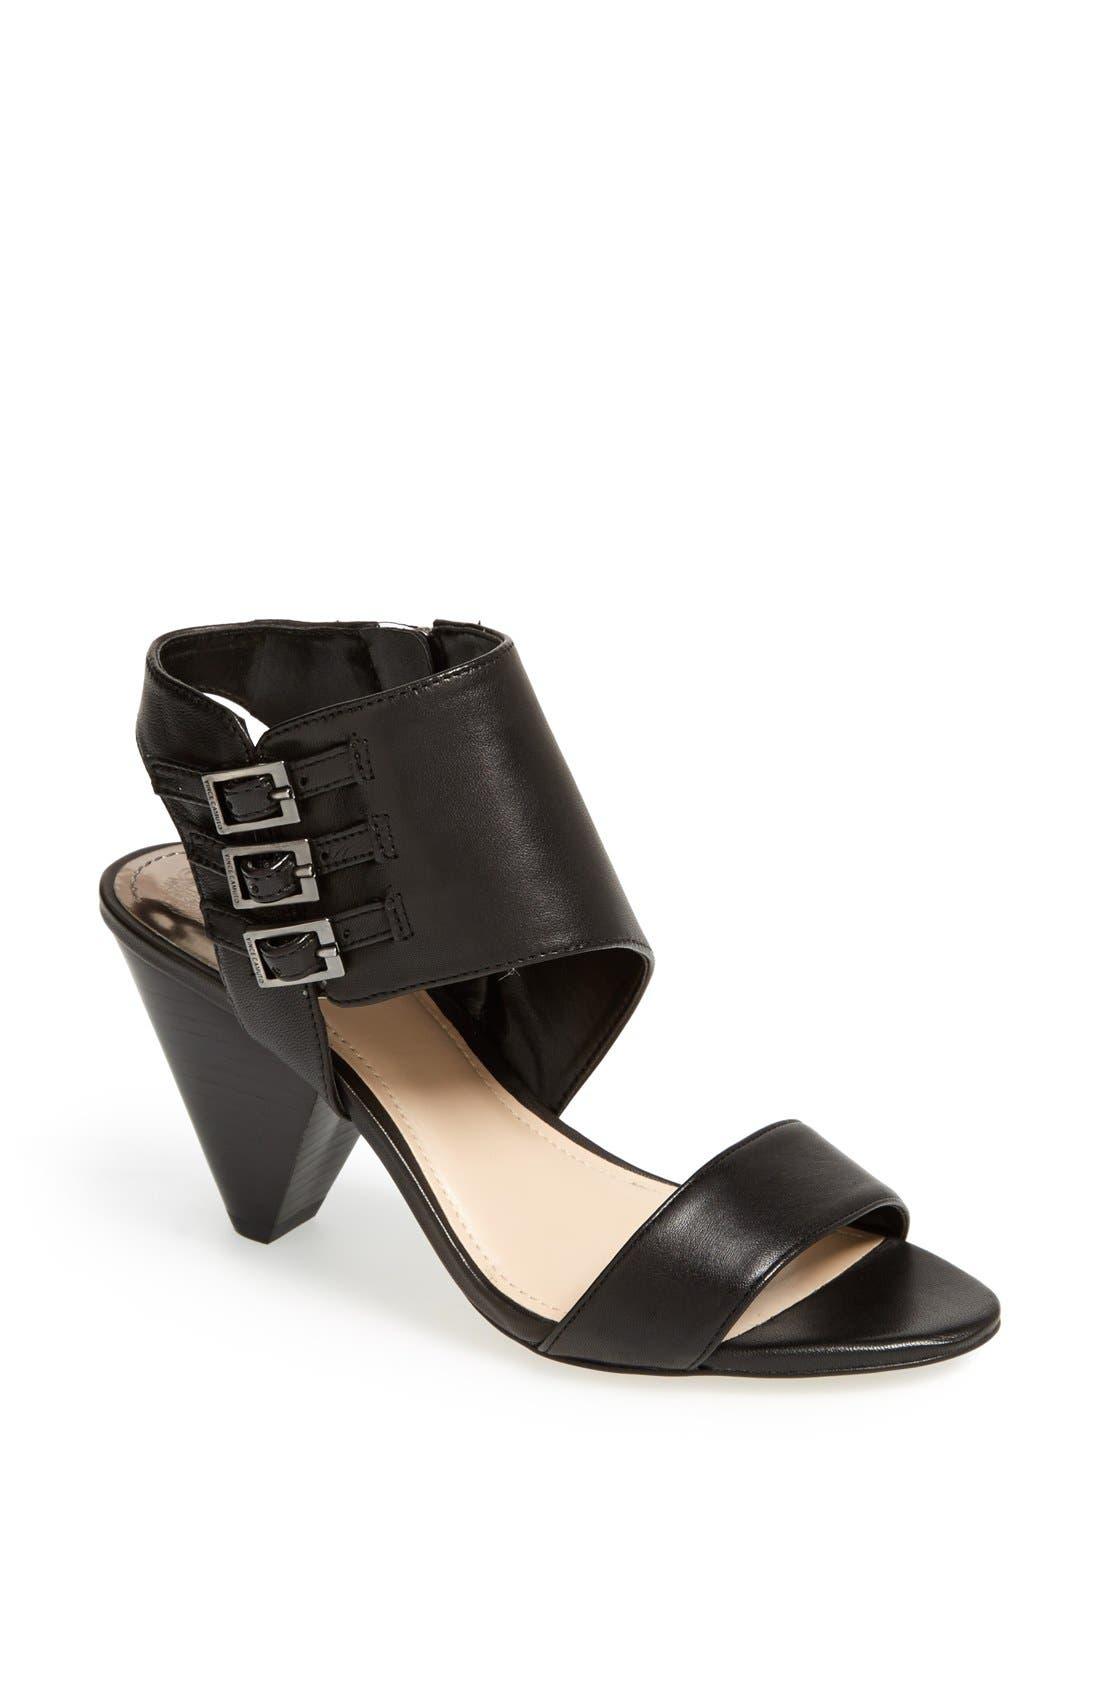 Main Image - Vince Camuto 'Edrika' Sandal